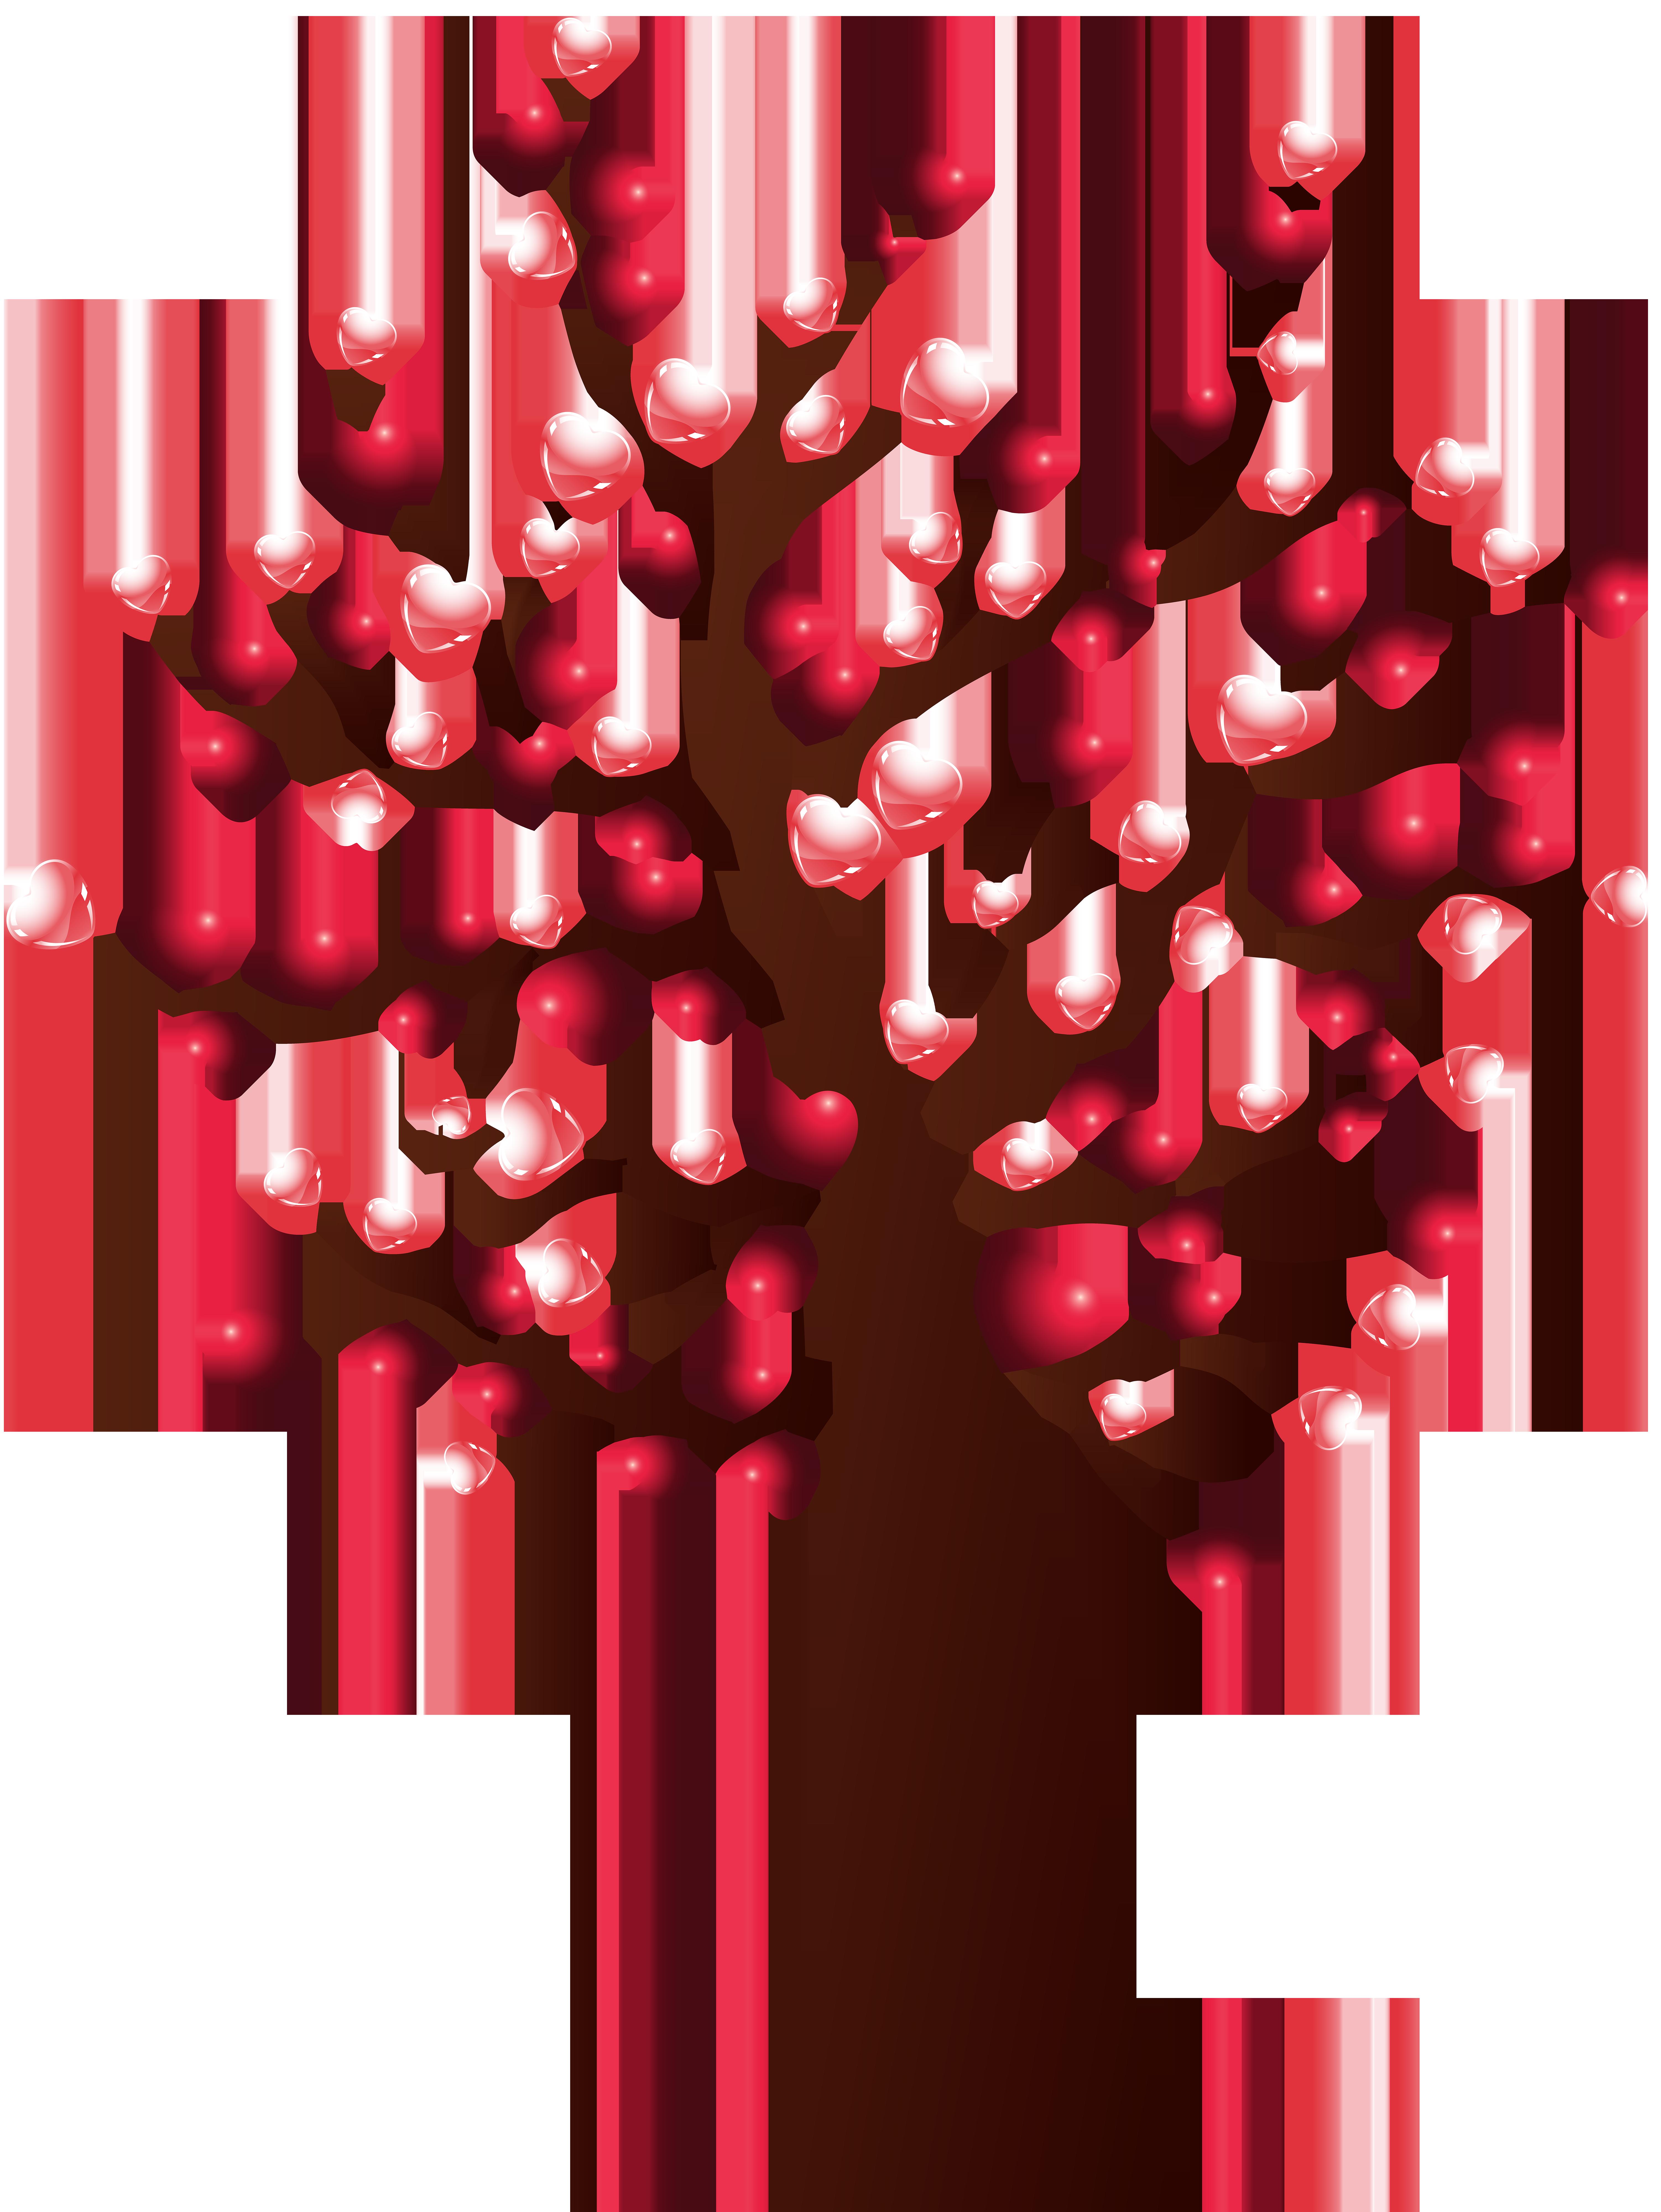 Heart Tree Transparent Clip Art Image | Gallery Yopriceville - High ... clip art transparent download